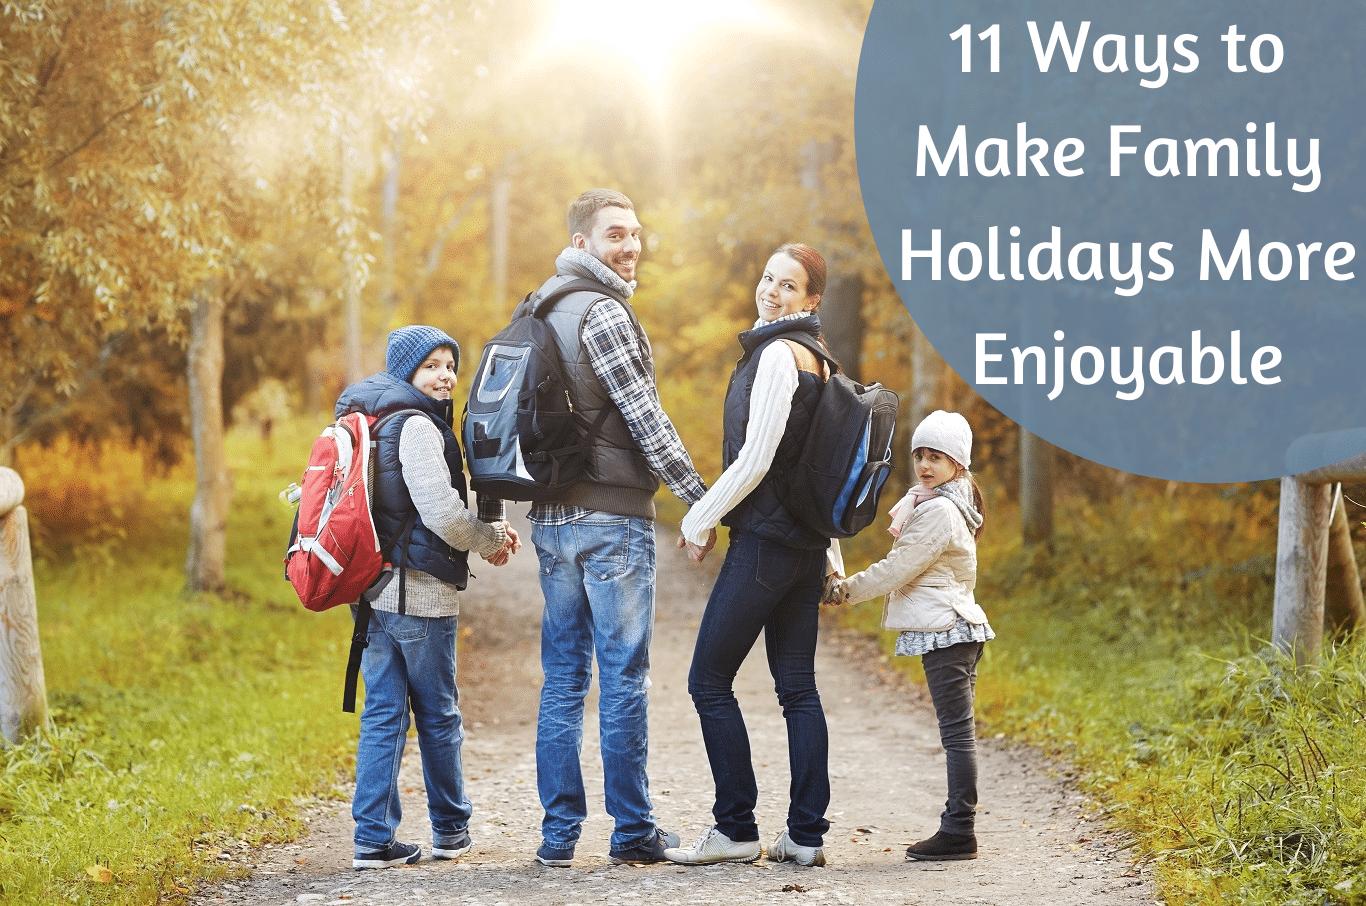 11 Ways to Make Family Holidays More Enjoyable